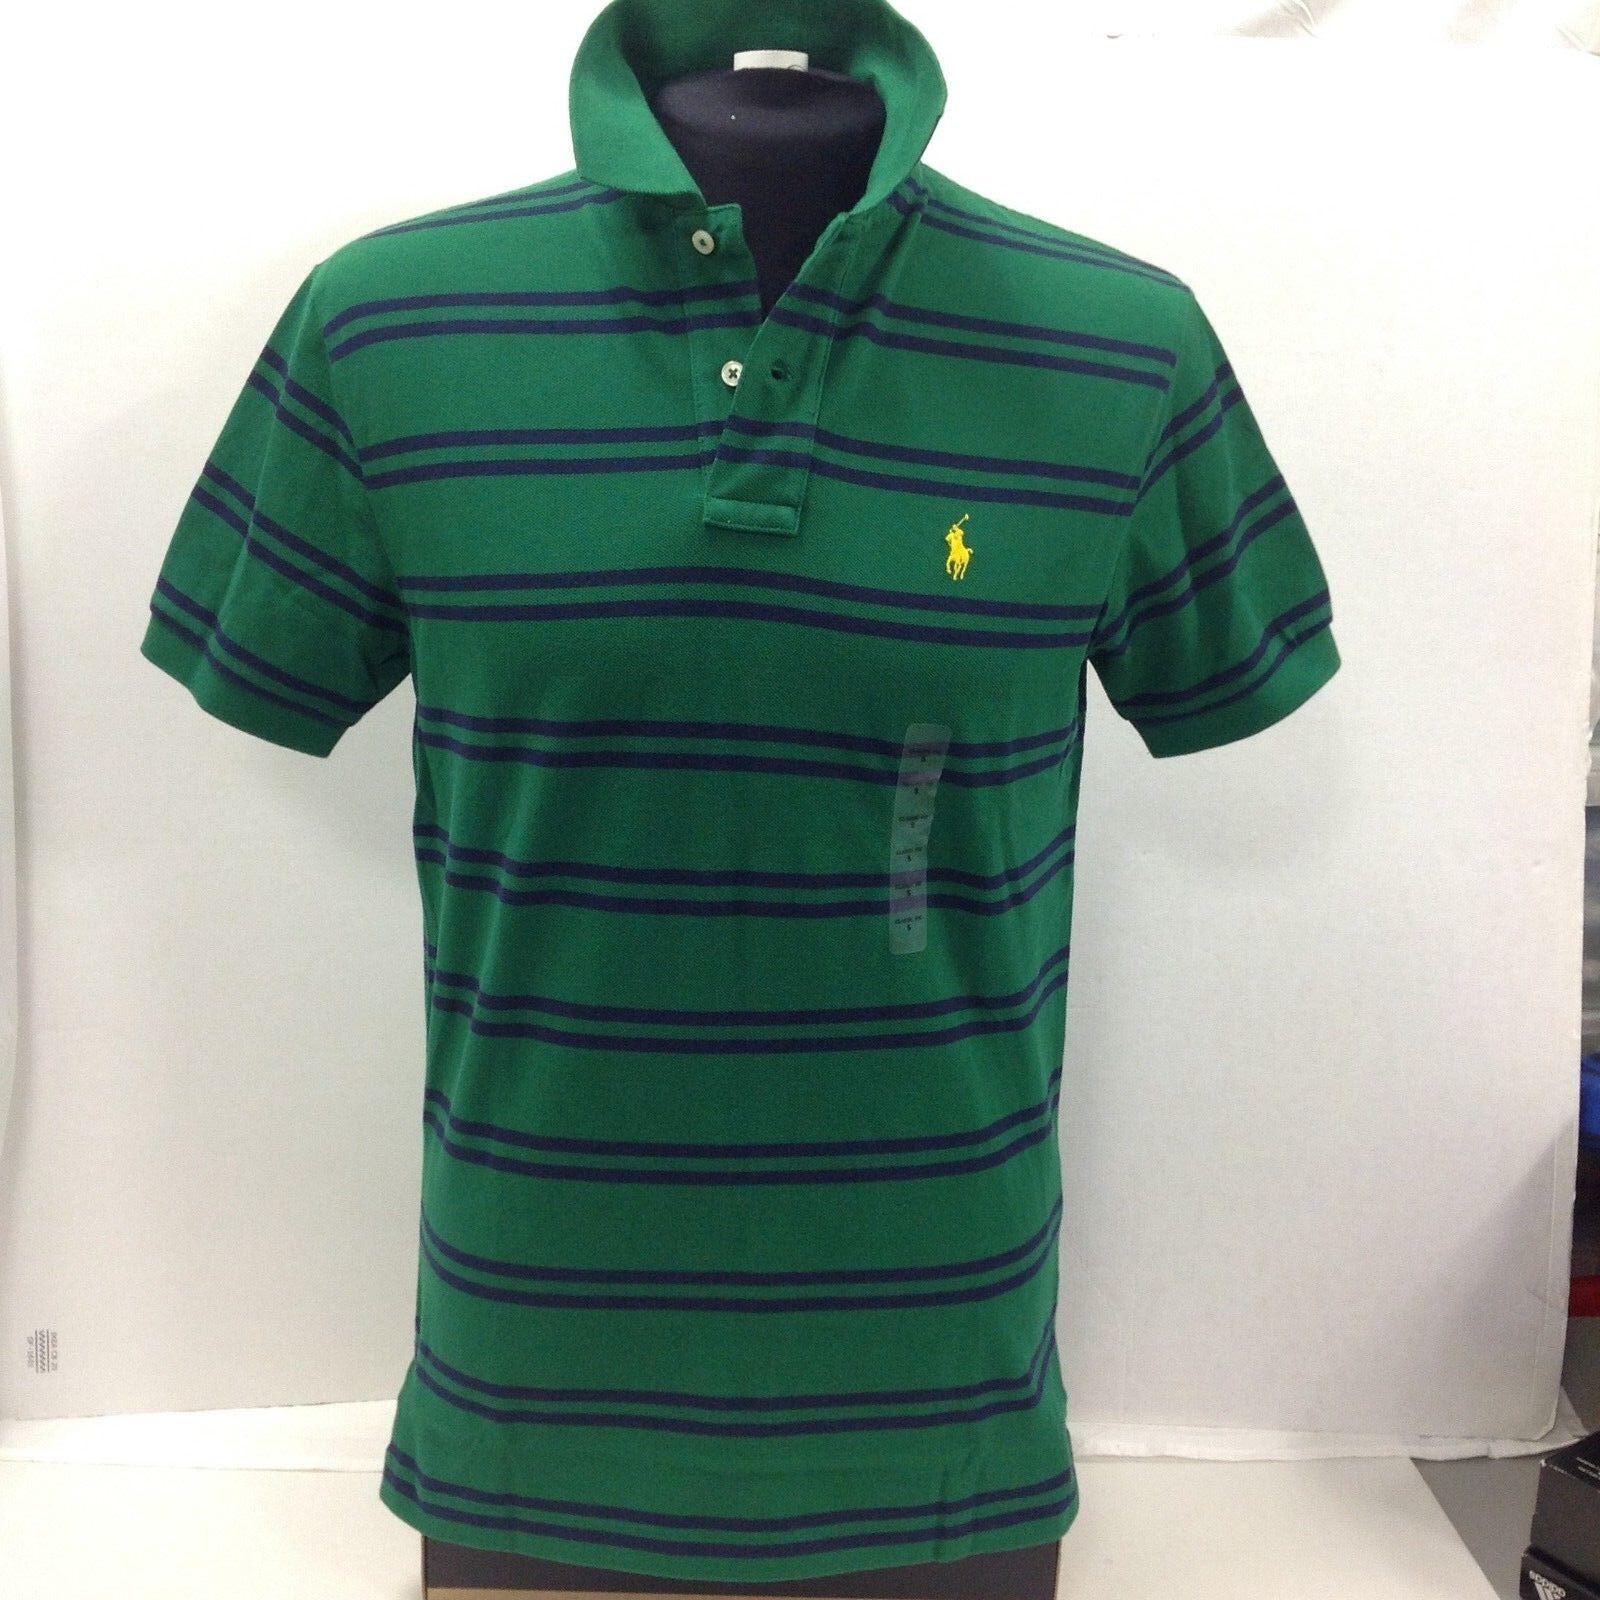 Polo Ralph Lauren Double Stripe Men's Polo-Shirt, Size S